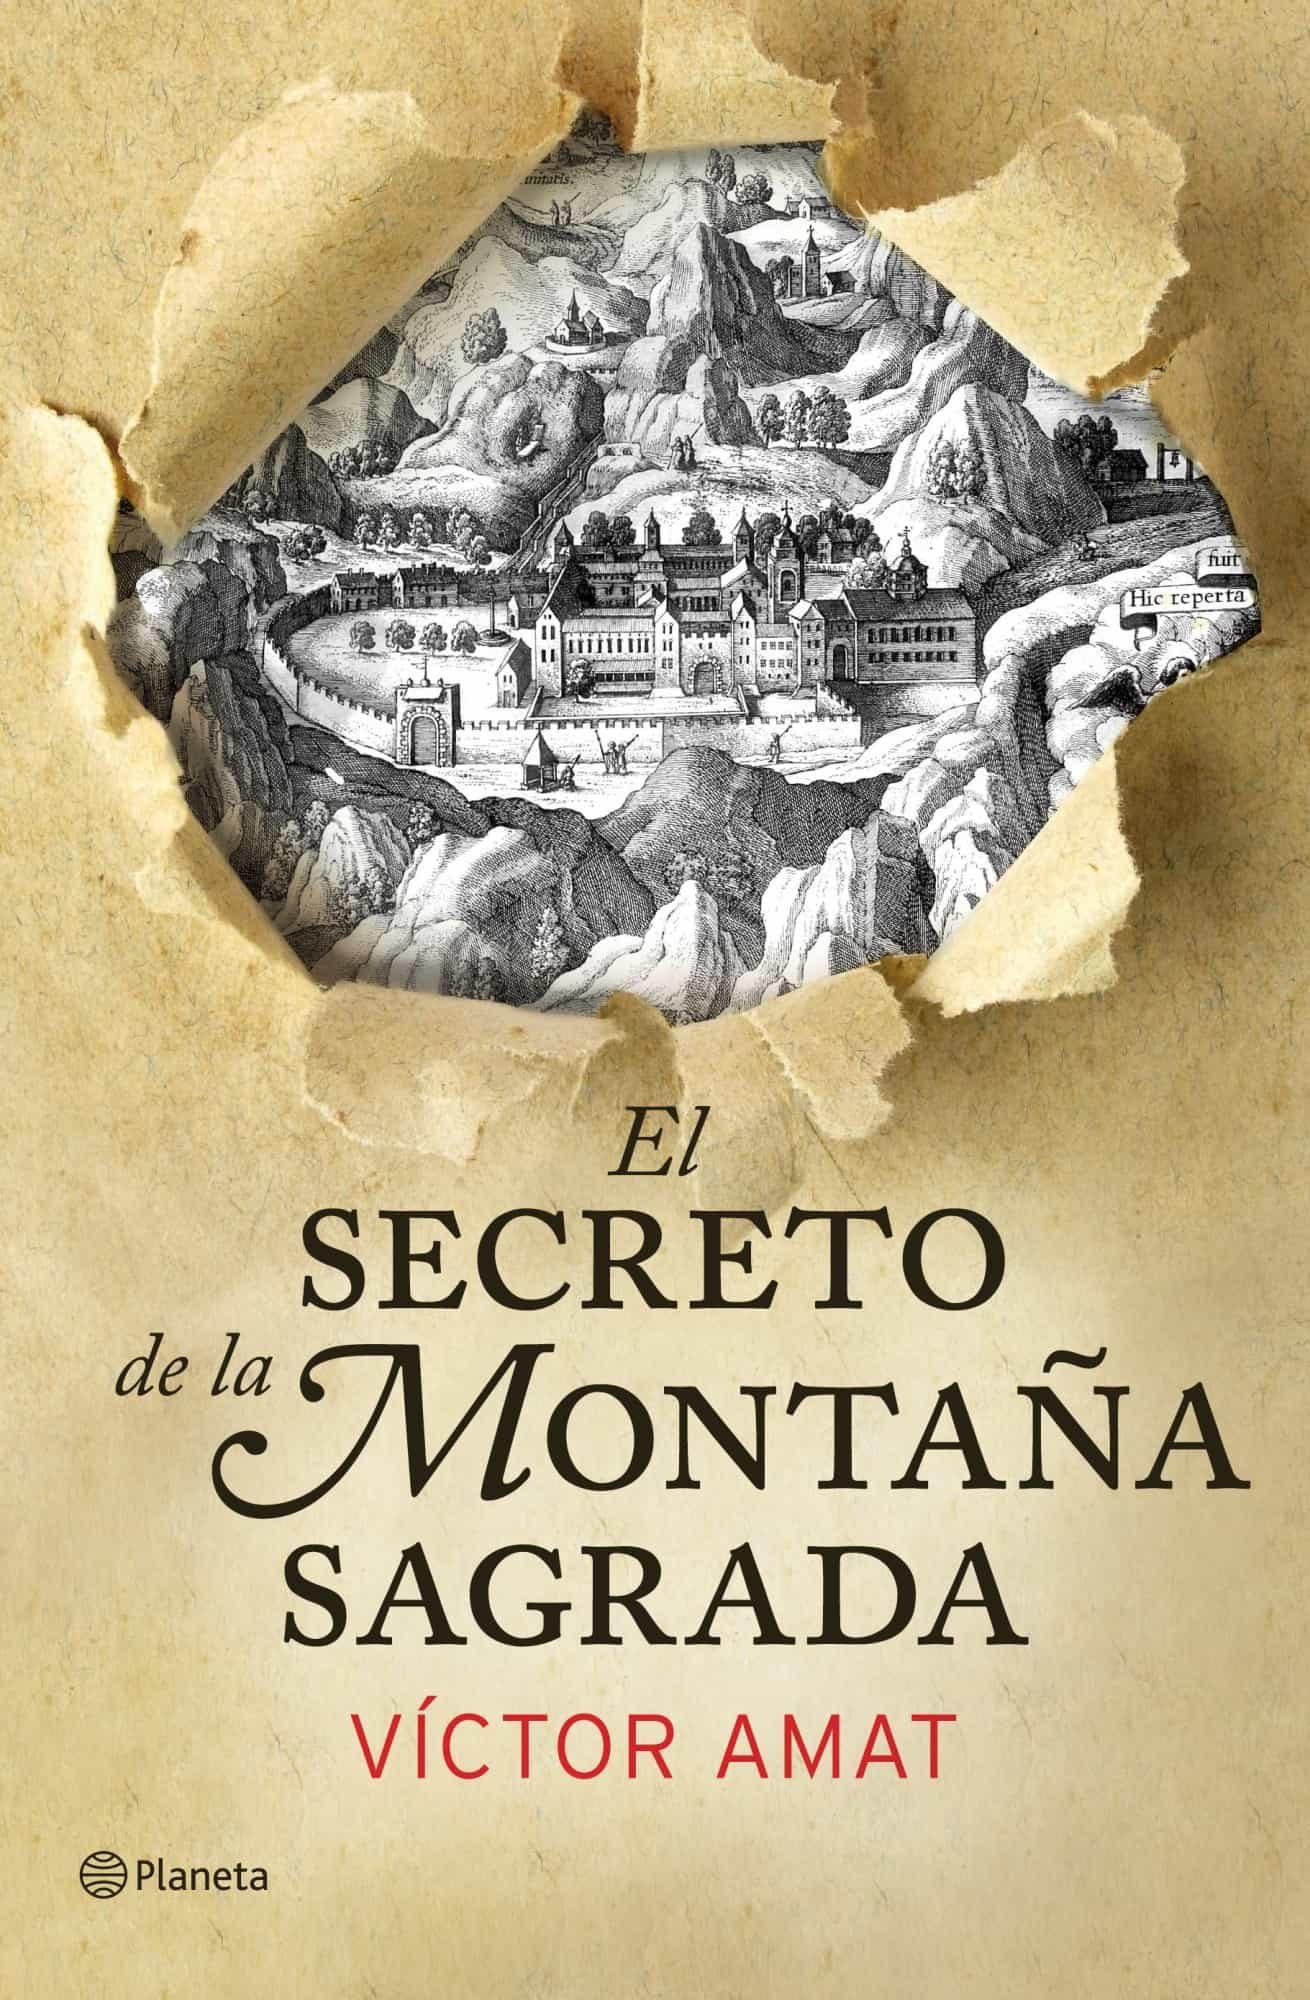 El secreto de la montaña sagrada (Fábula)